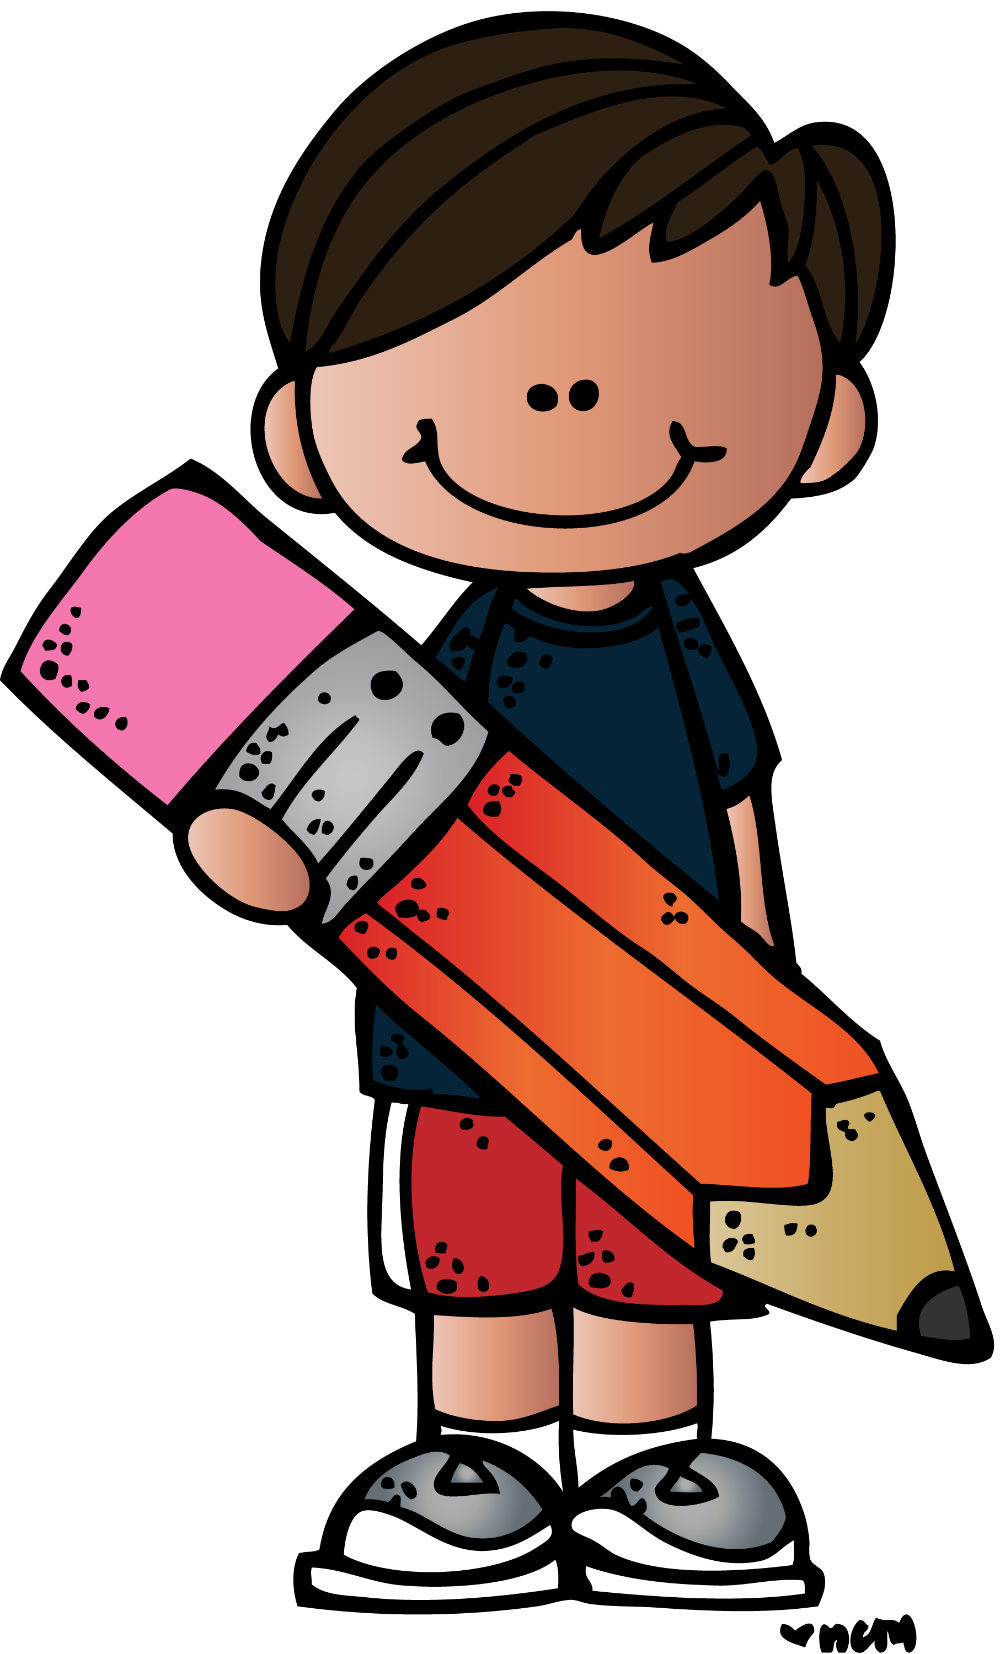 Free Melonheadz Homework Cliparts Download Free Clip Art Free Clip Art On Clipart Library Free Clip Art Clip Art Melonheadz Clipart